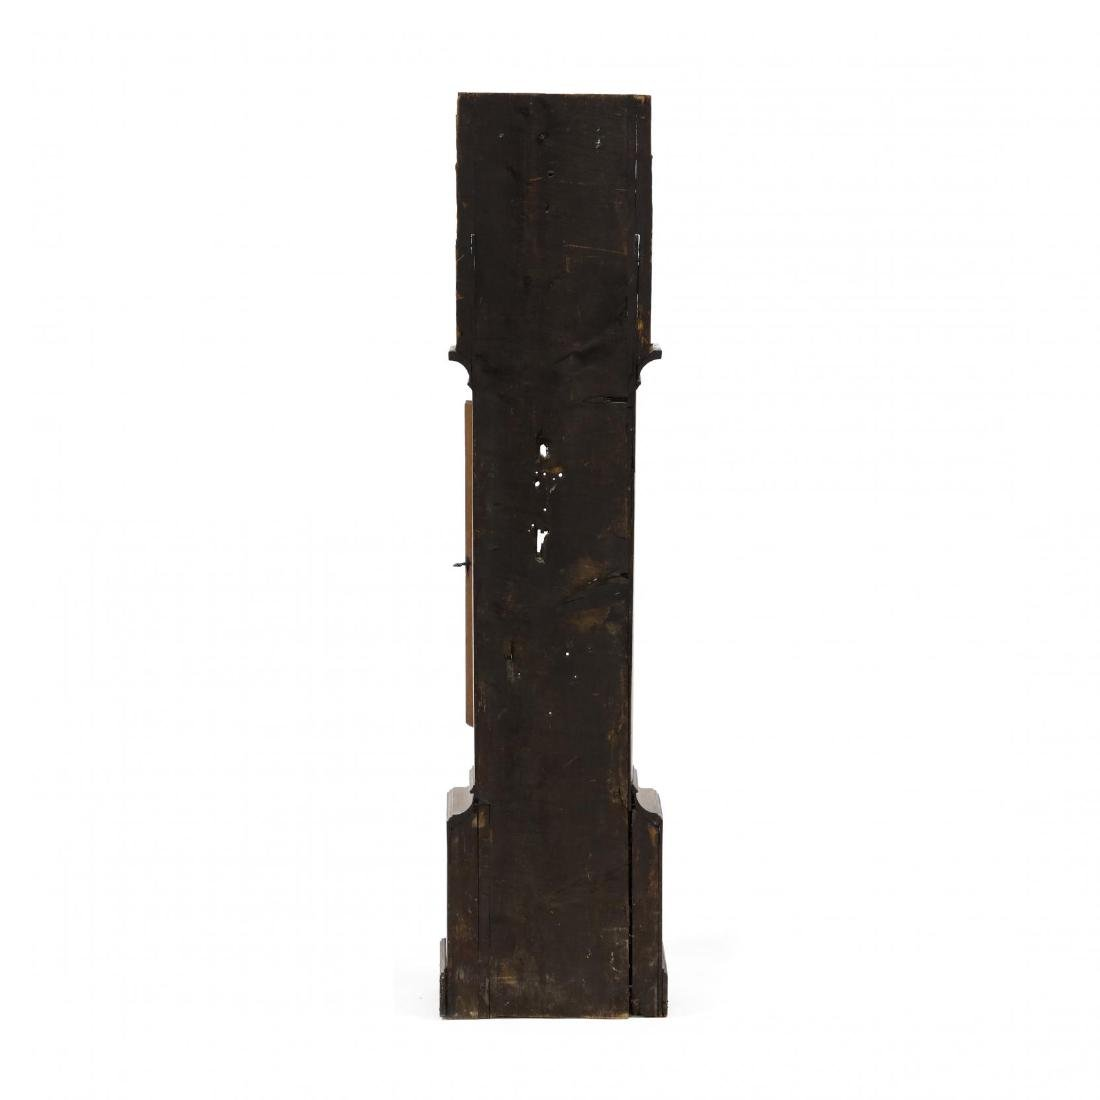 English Tall Case Clock, Richard Kenyon - 3